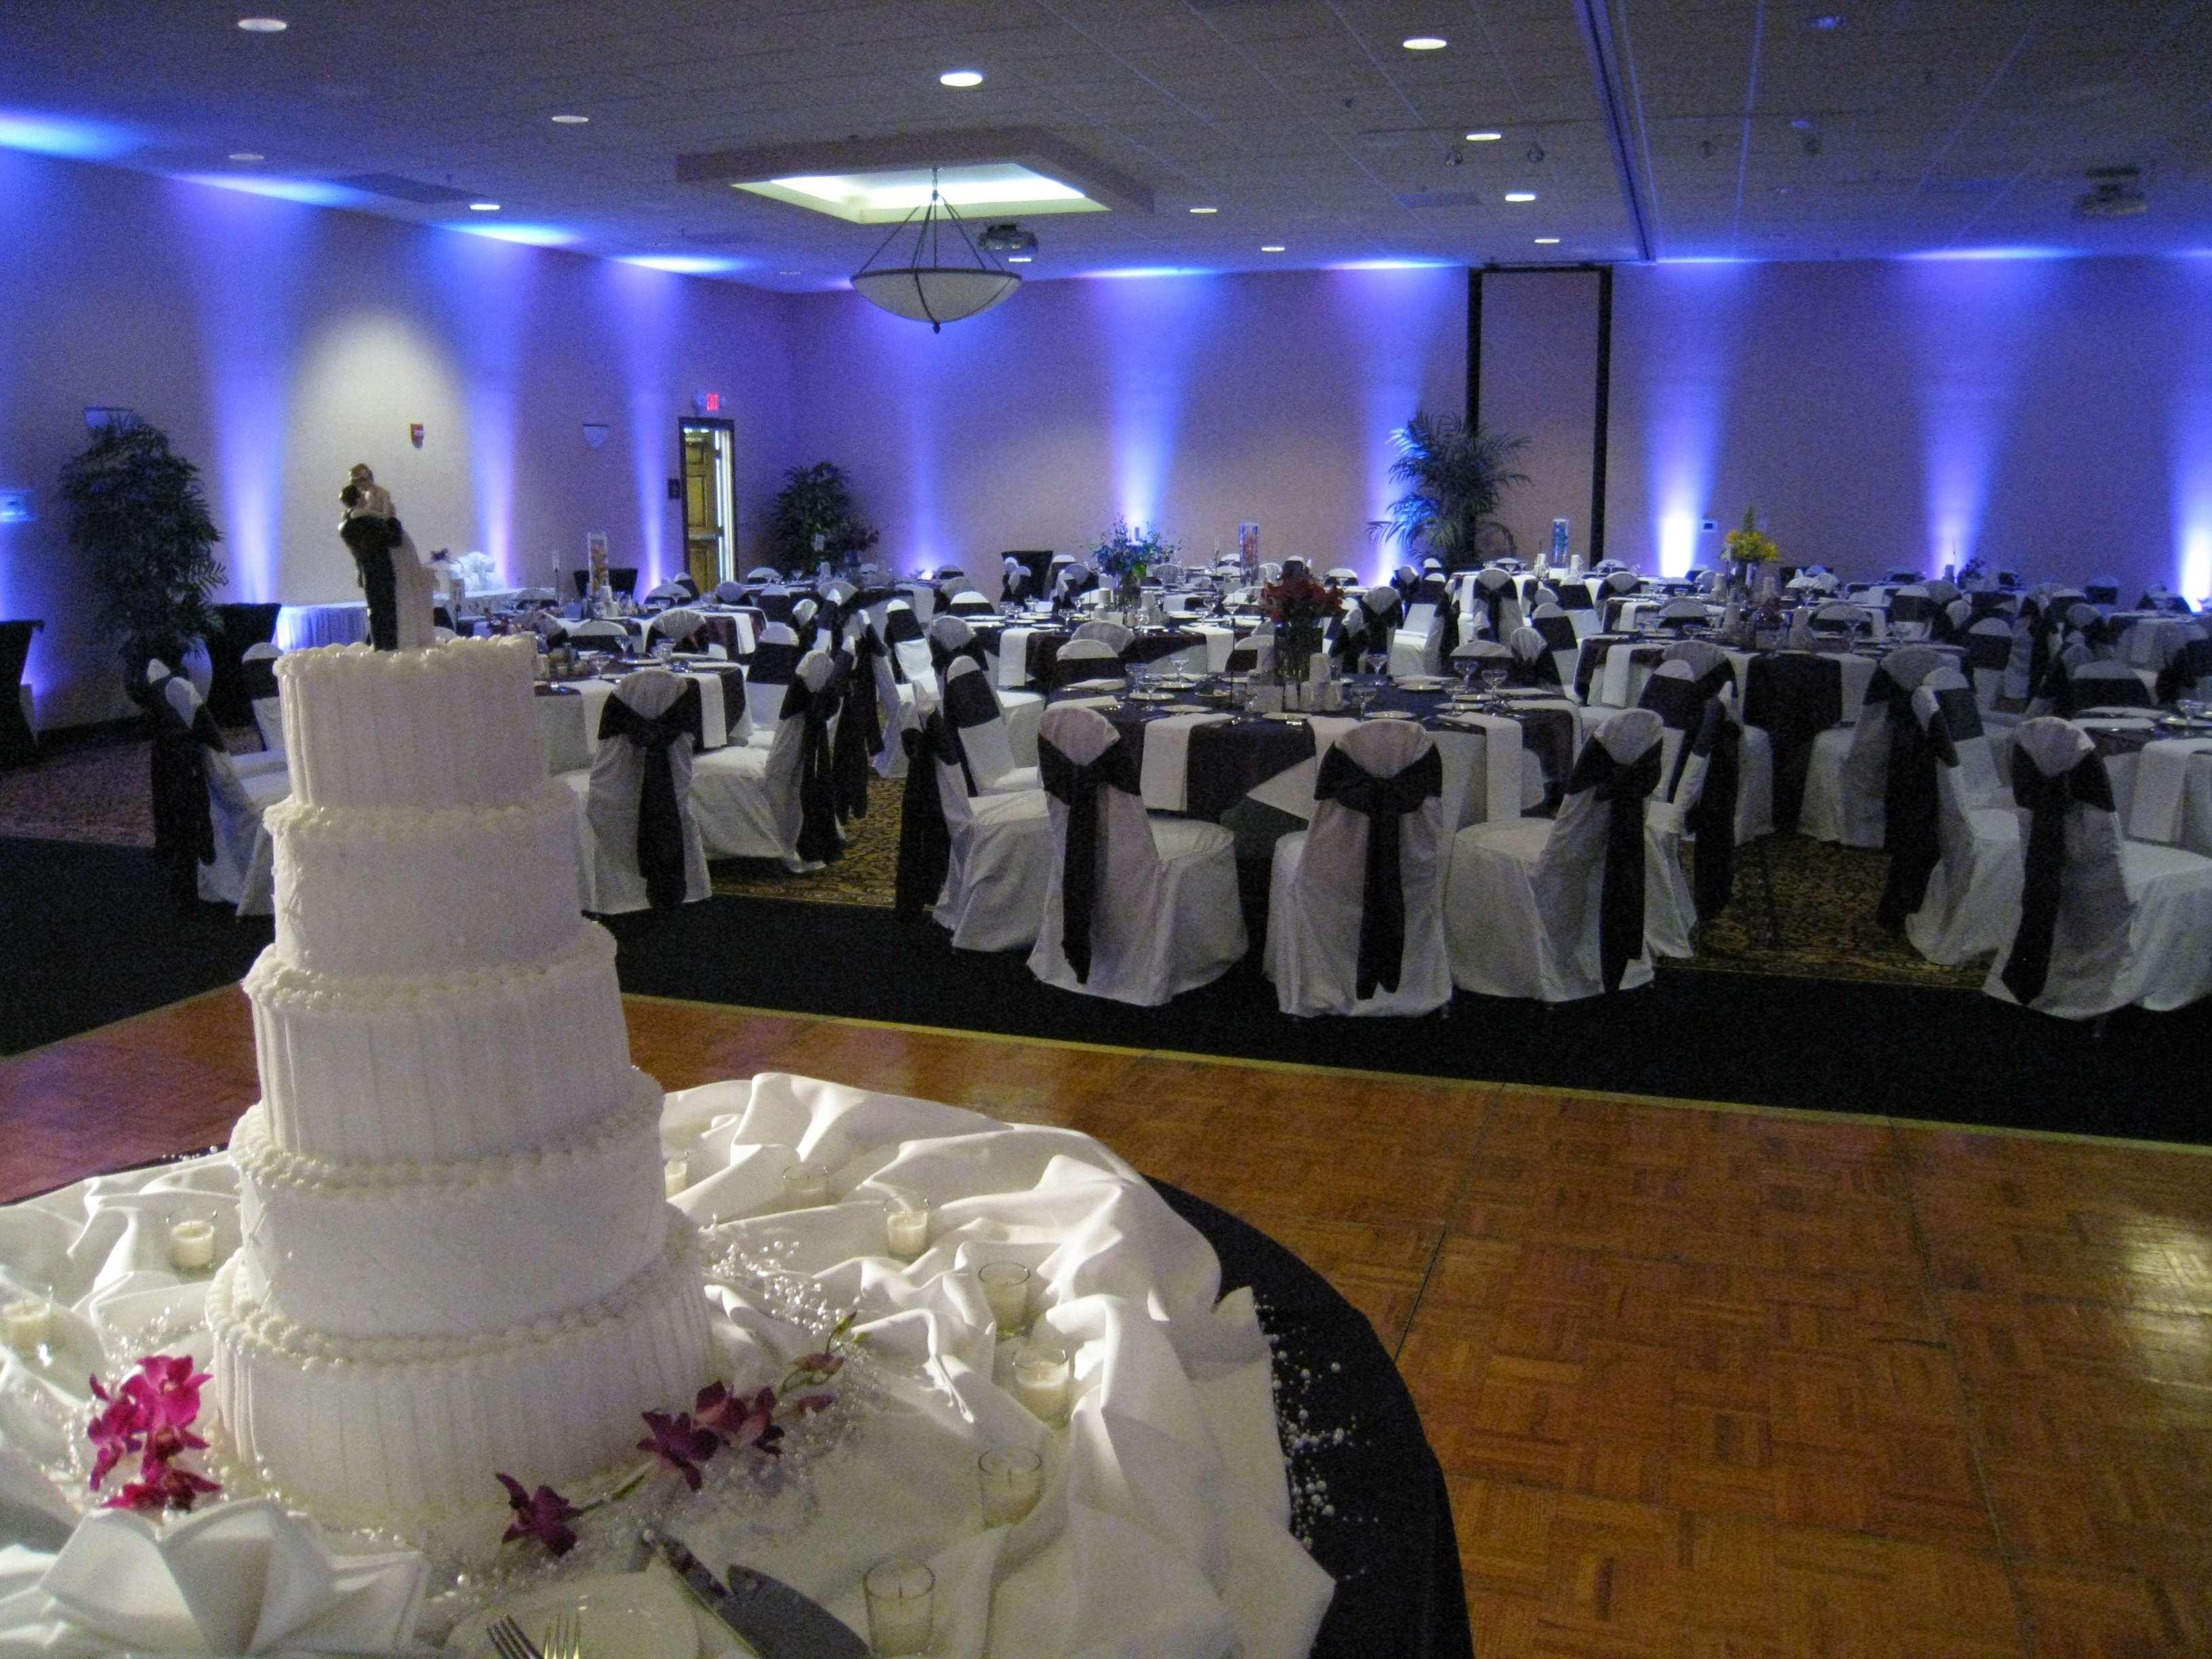 Hilton Garden Inn Champaign/ Urbana image 5